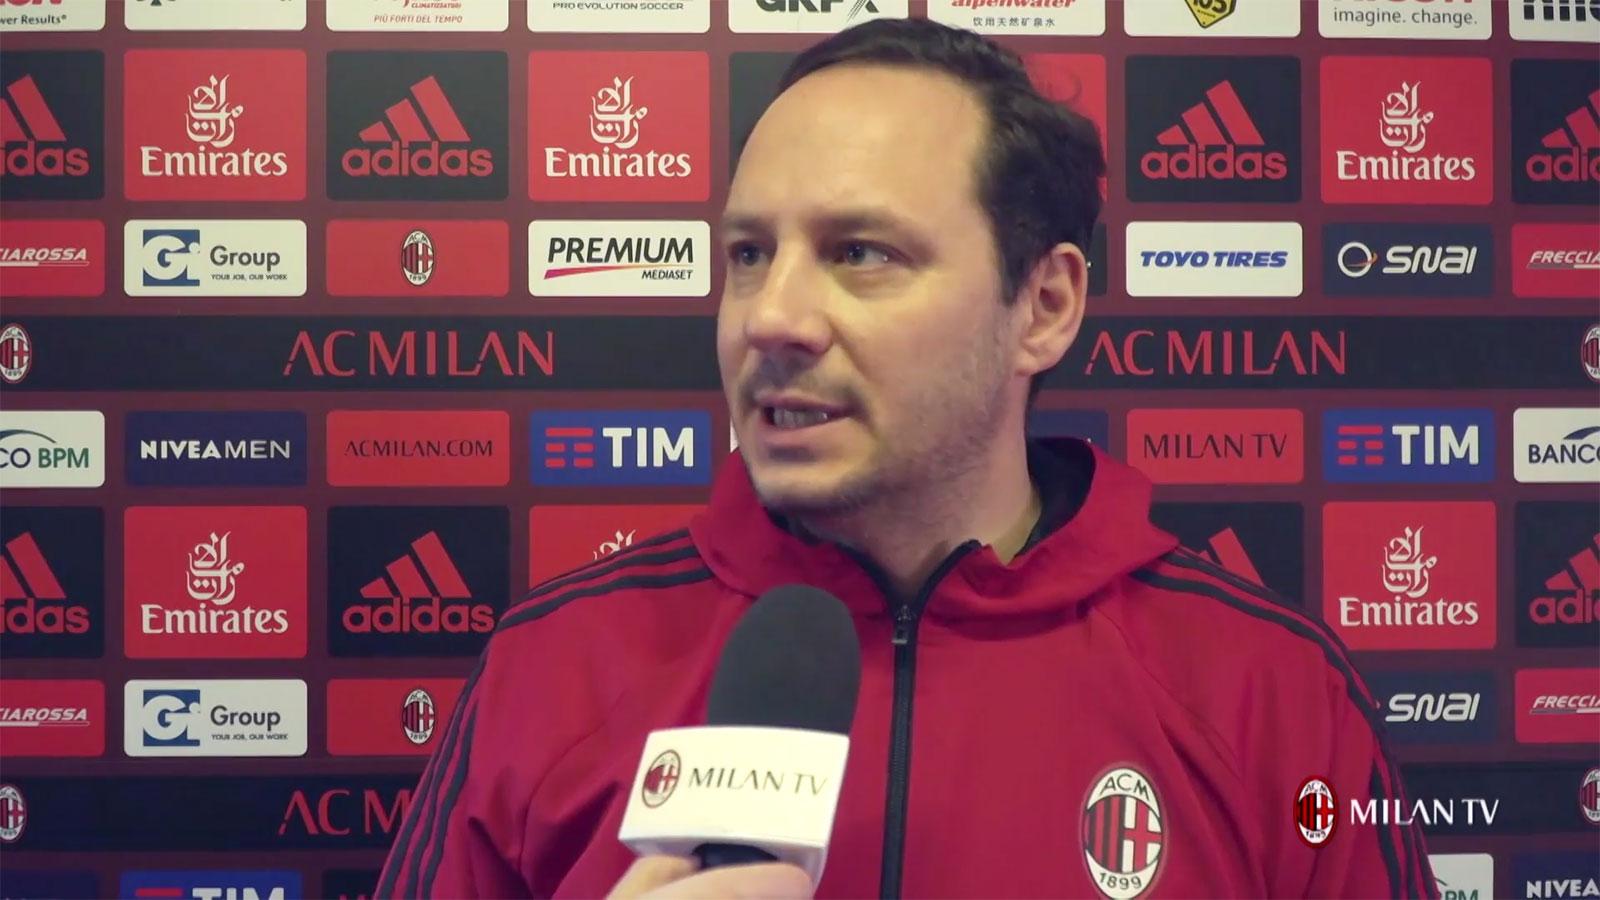 Stefano Mazzoni talking to MilanTV at Milanello on January 18, 2018. (@acmilan.com)